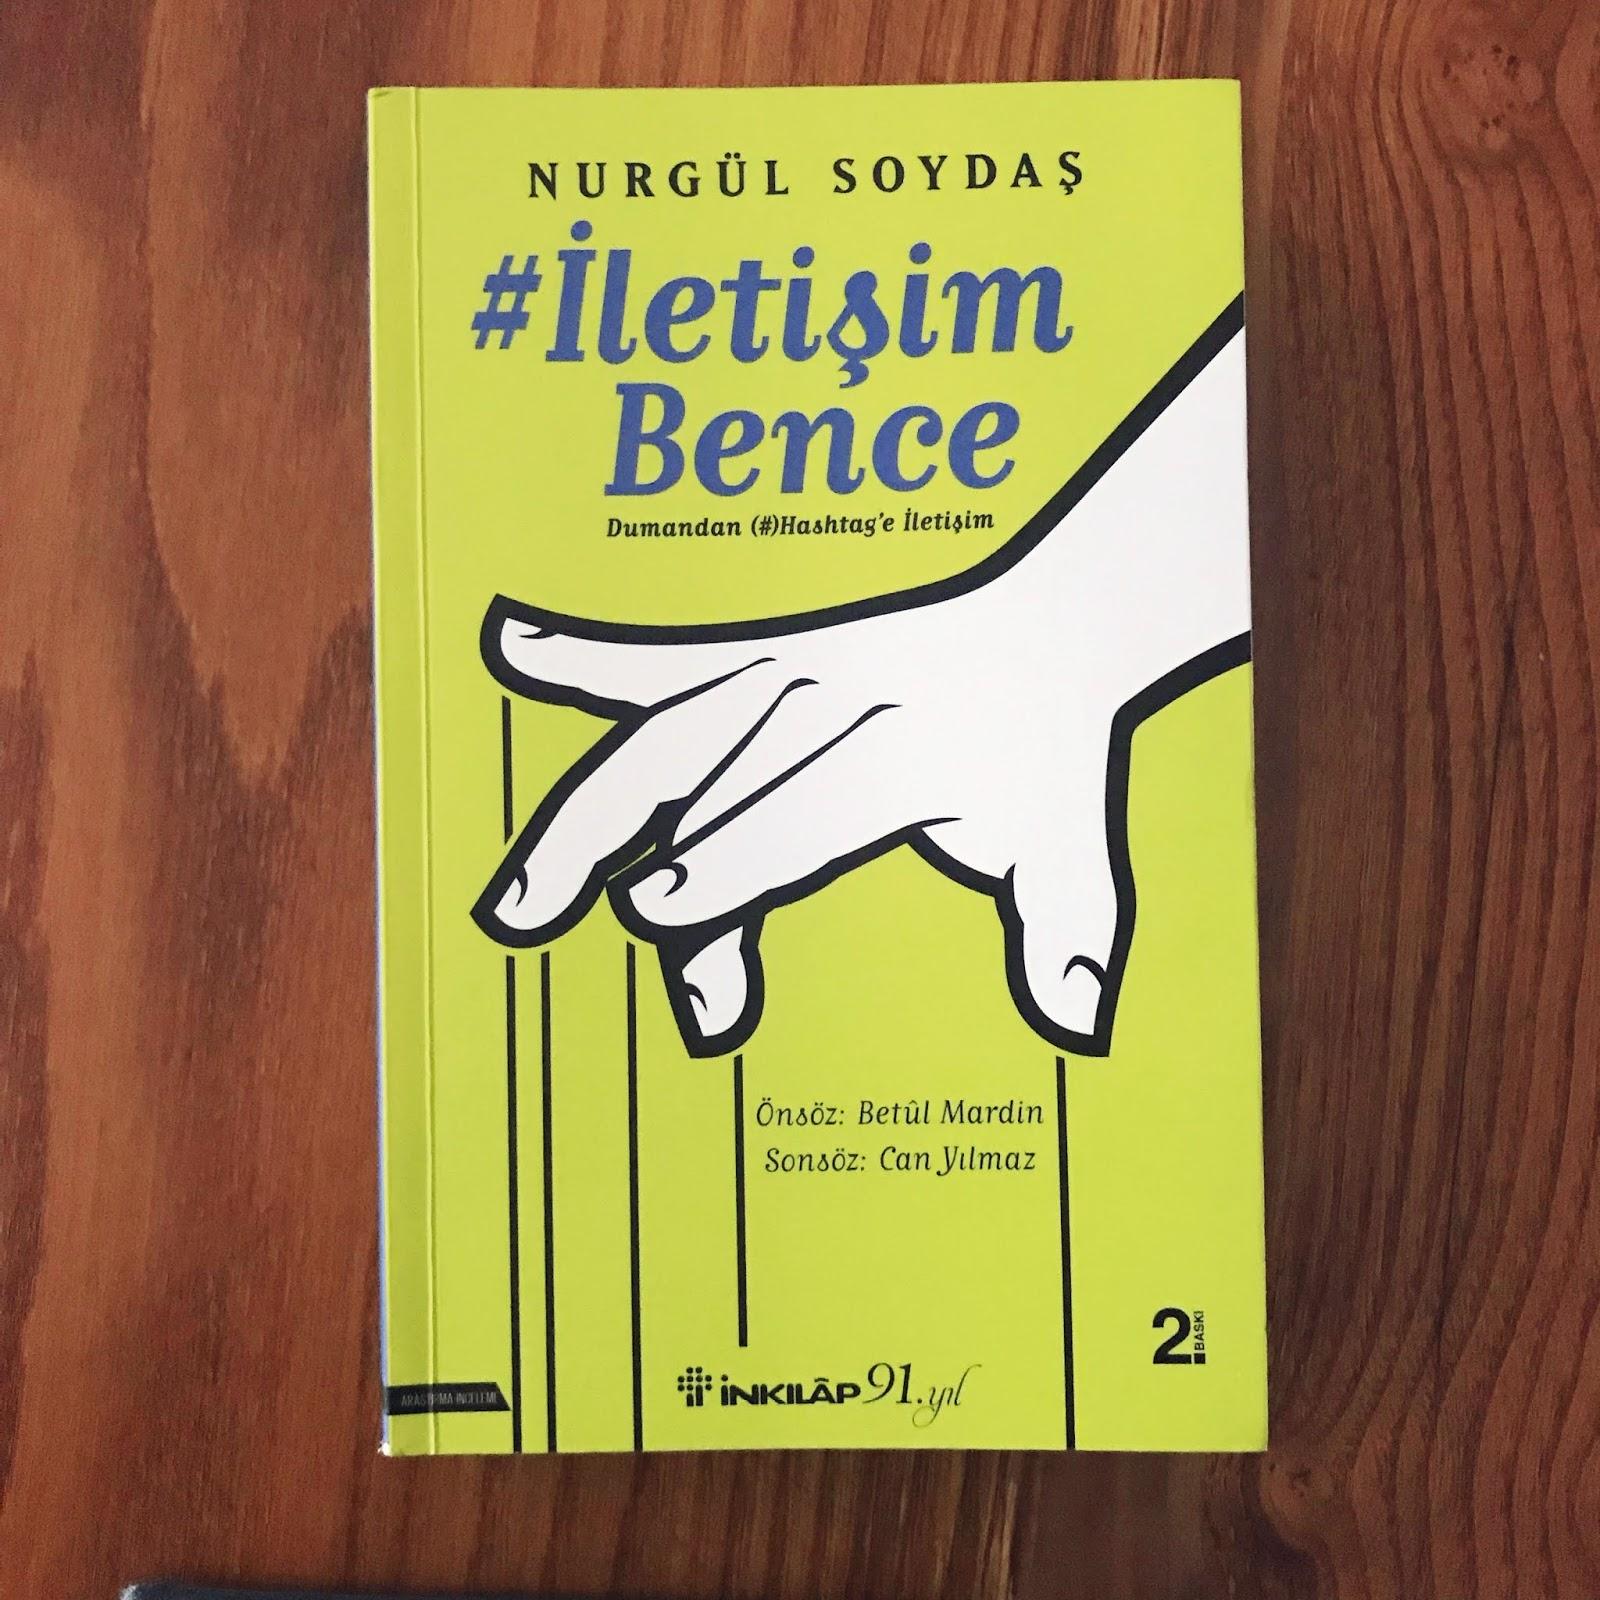 # Iletisim Bence - Dumandan (#)Hashtag'e Iletisim (Kitap)